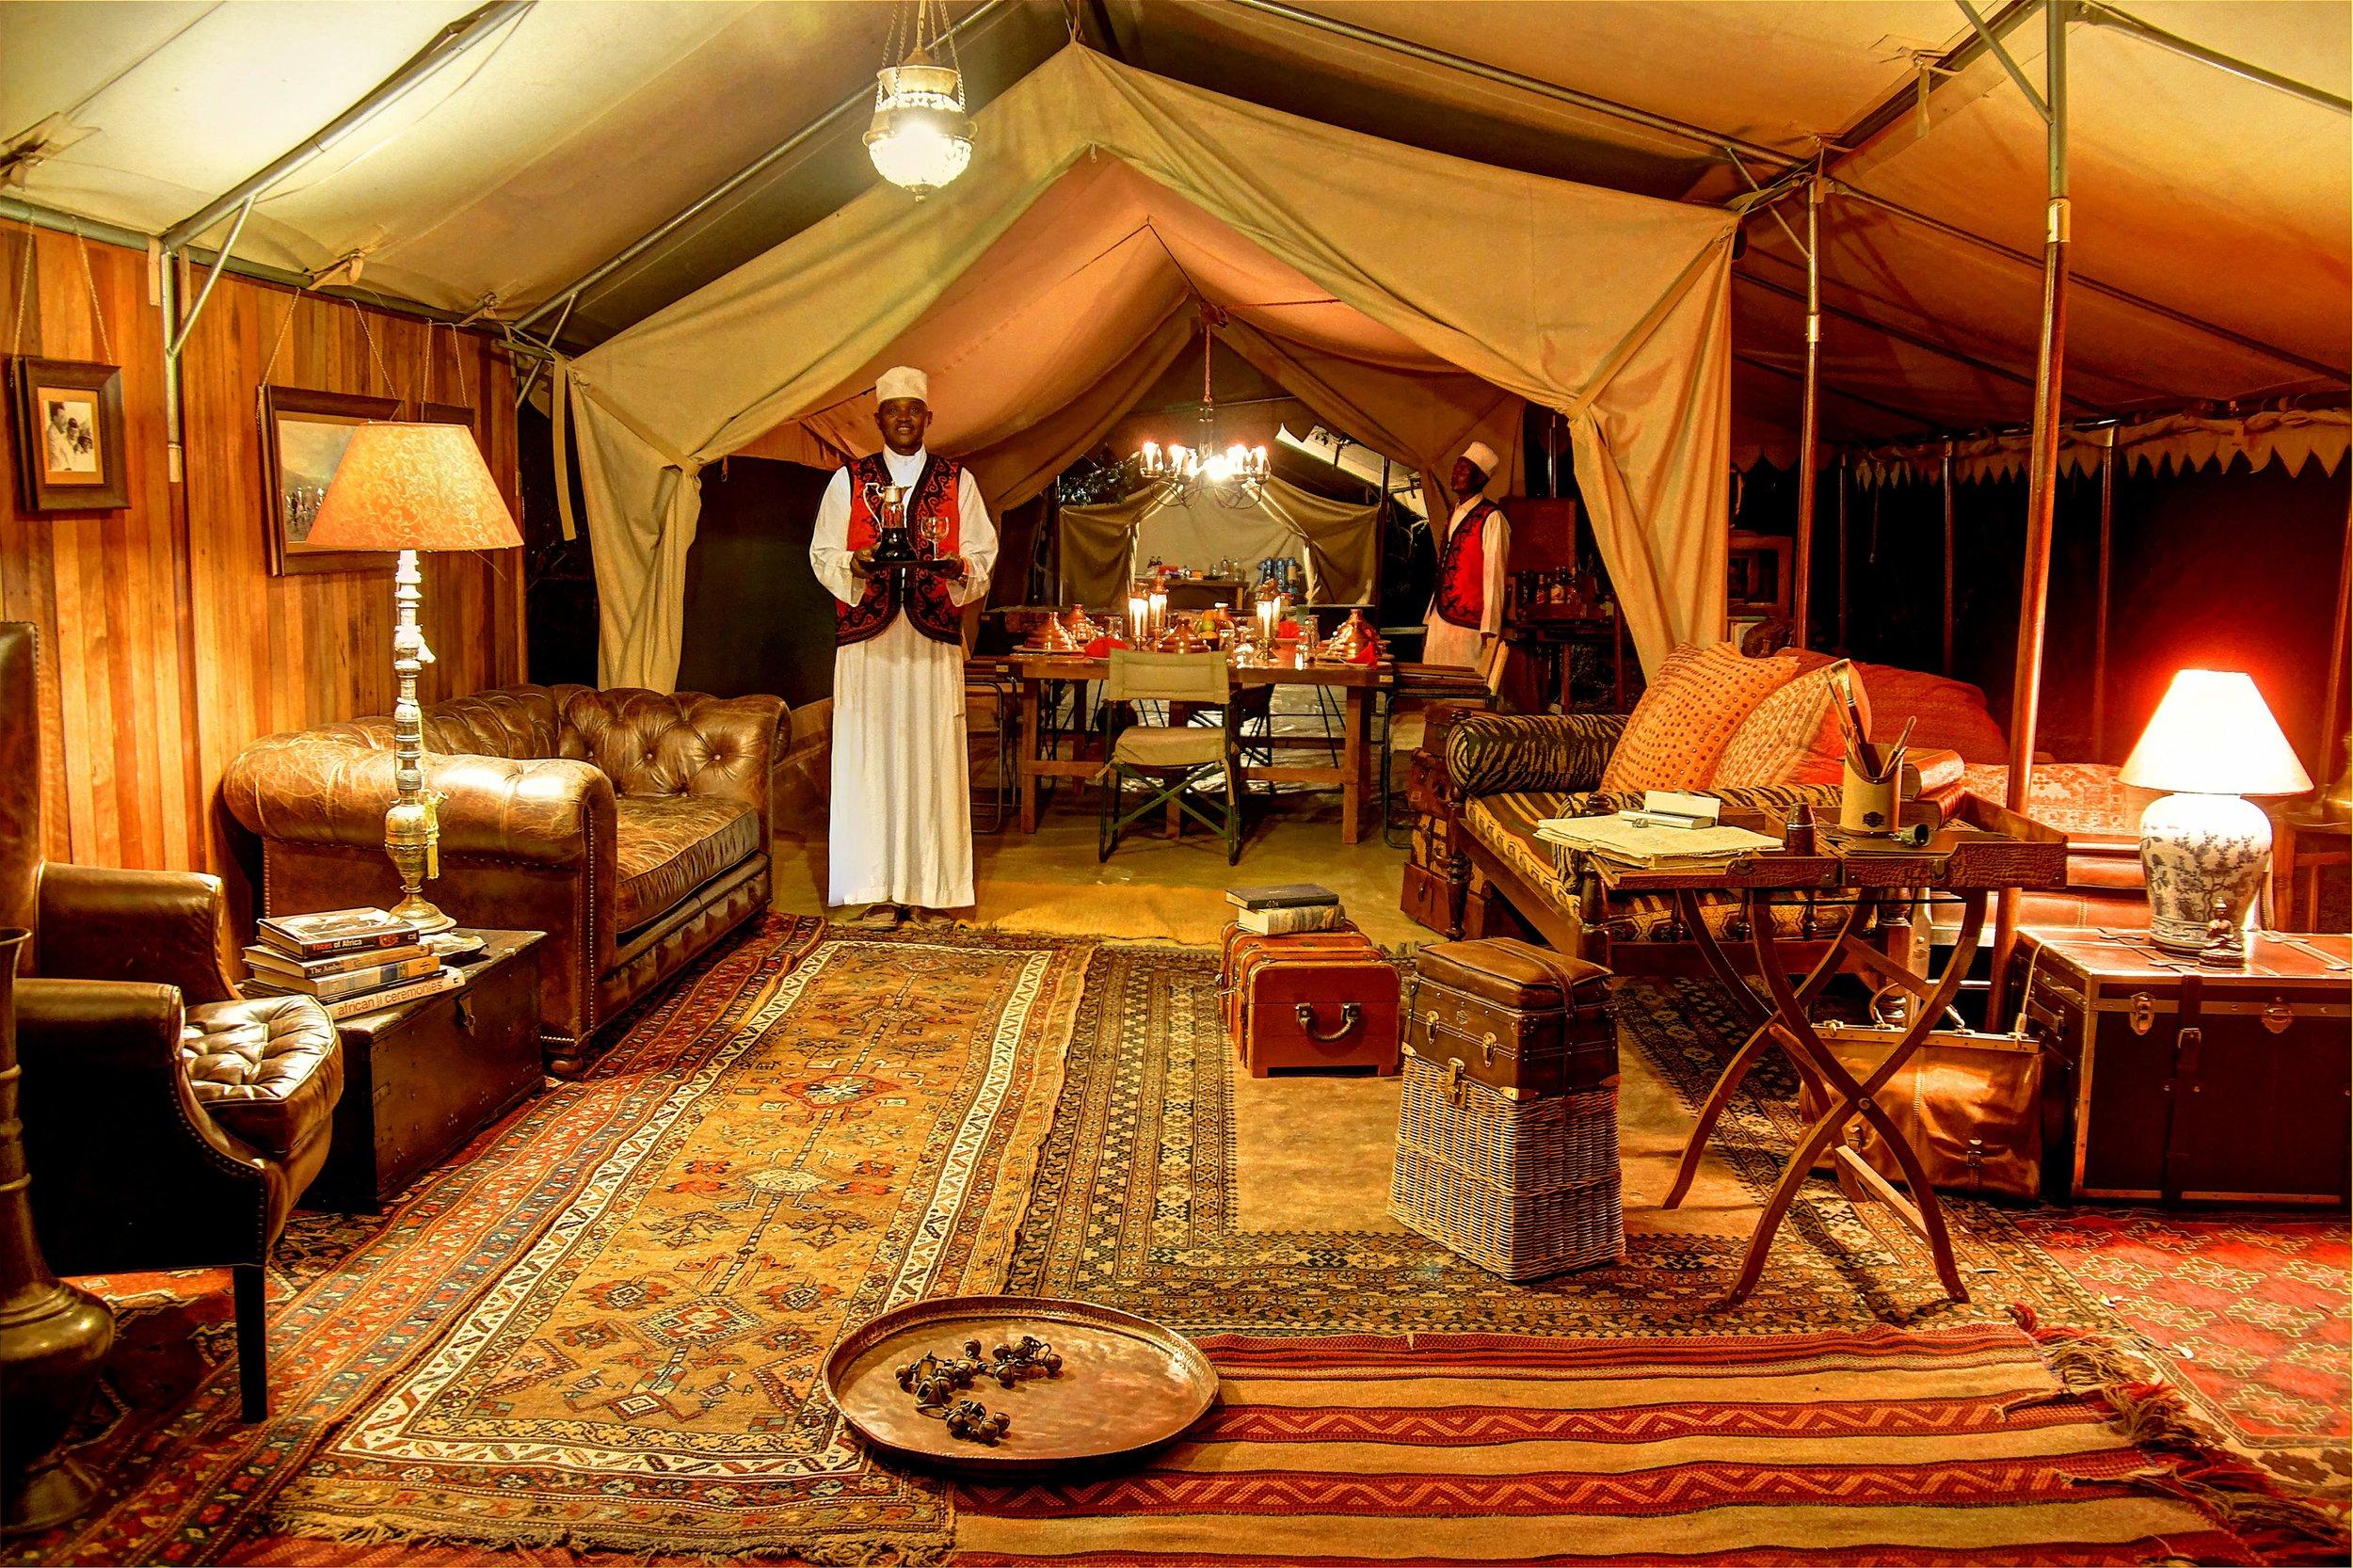 camp lounge tent charles welcome.jpg